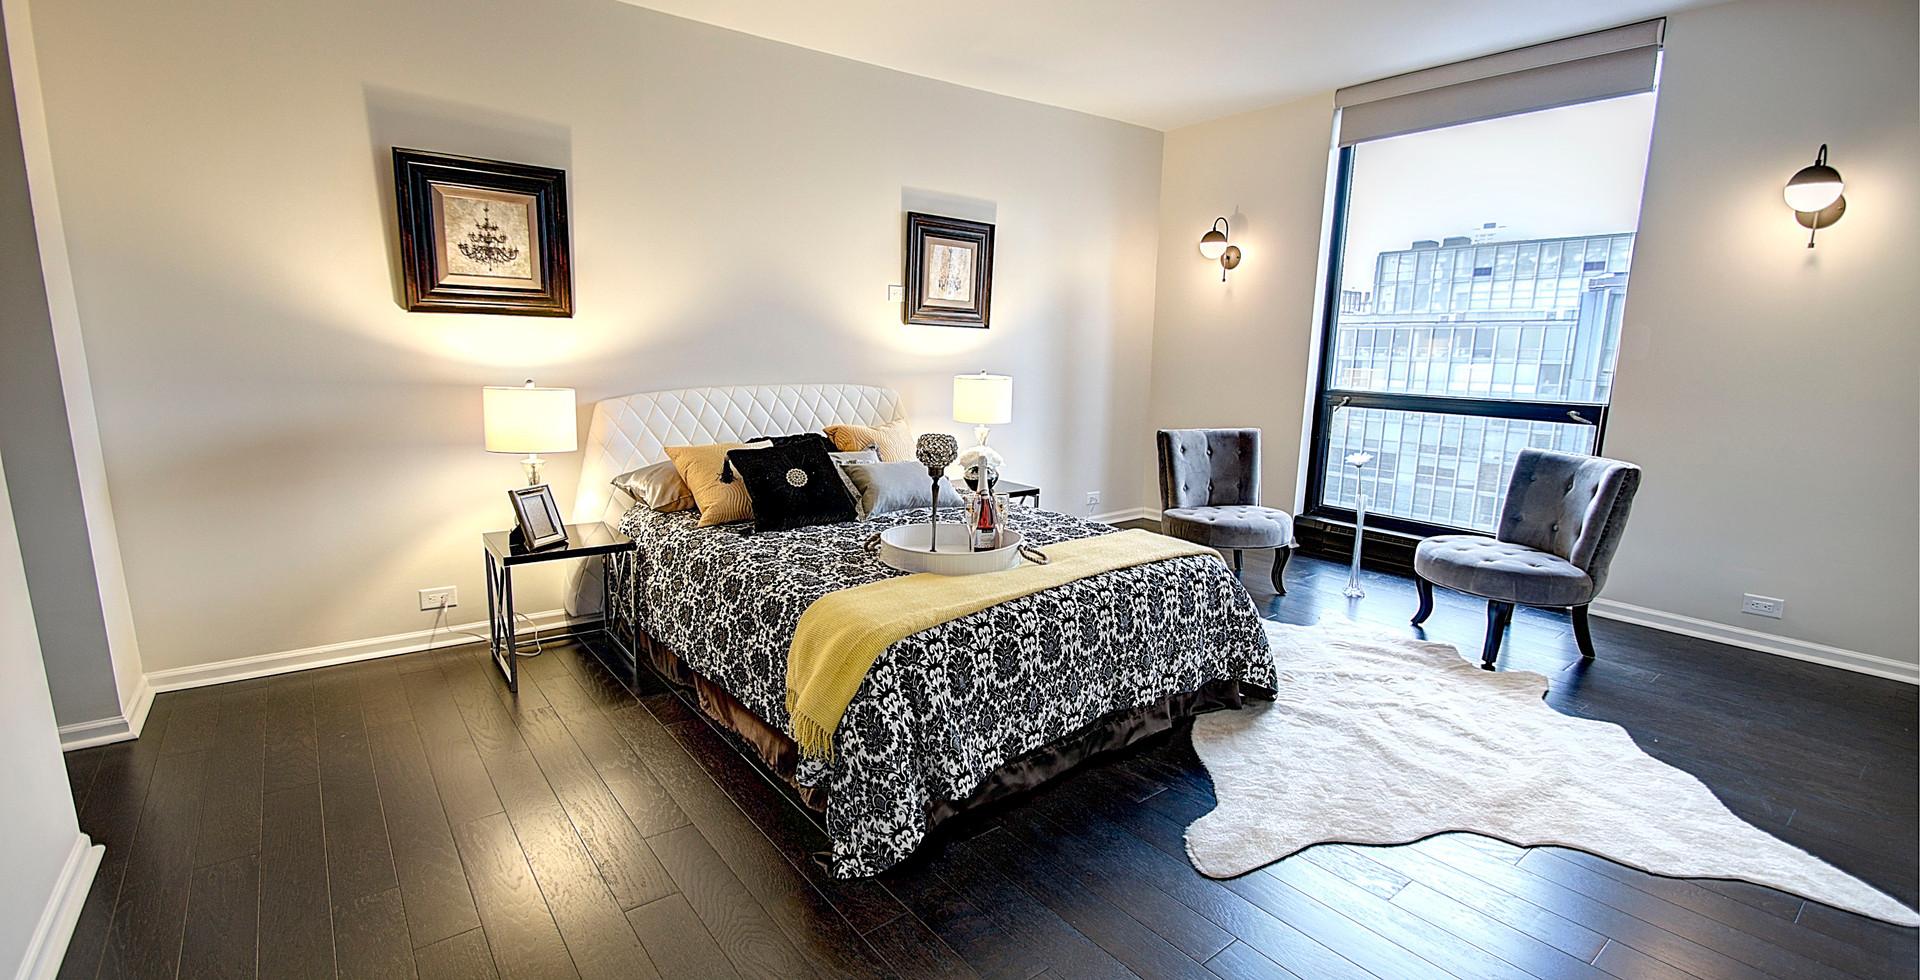 Bedroom in Lisle designed by MRM Home Design.jpg